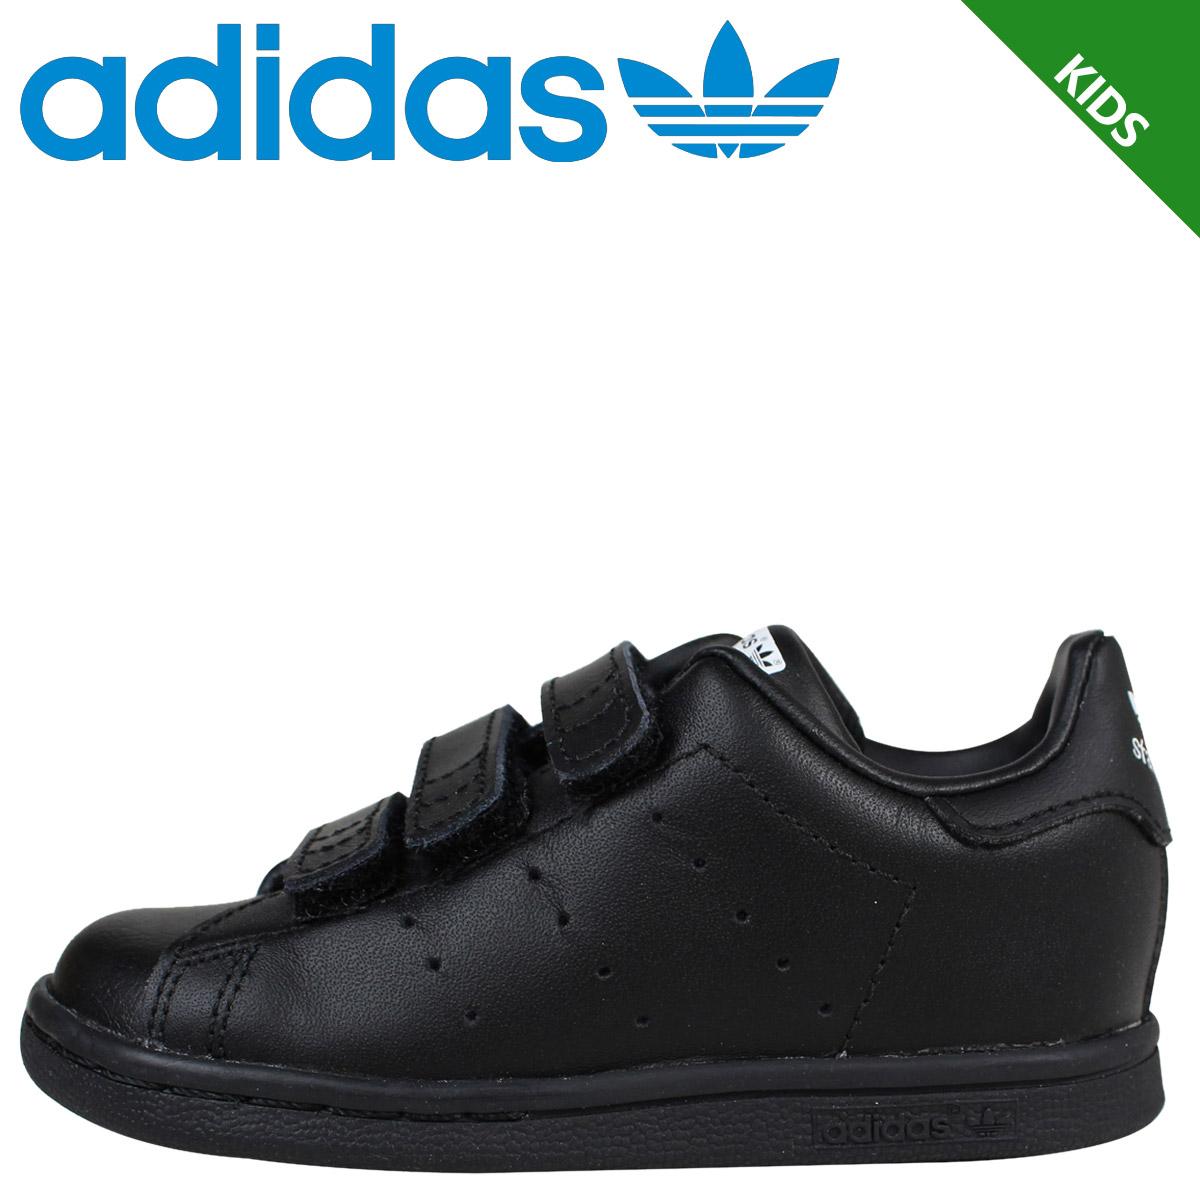 adidas stan smith kids black